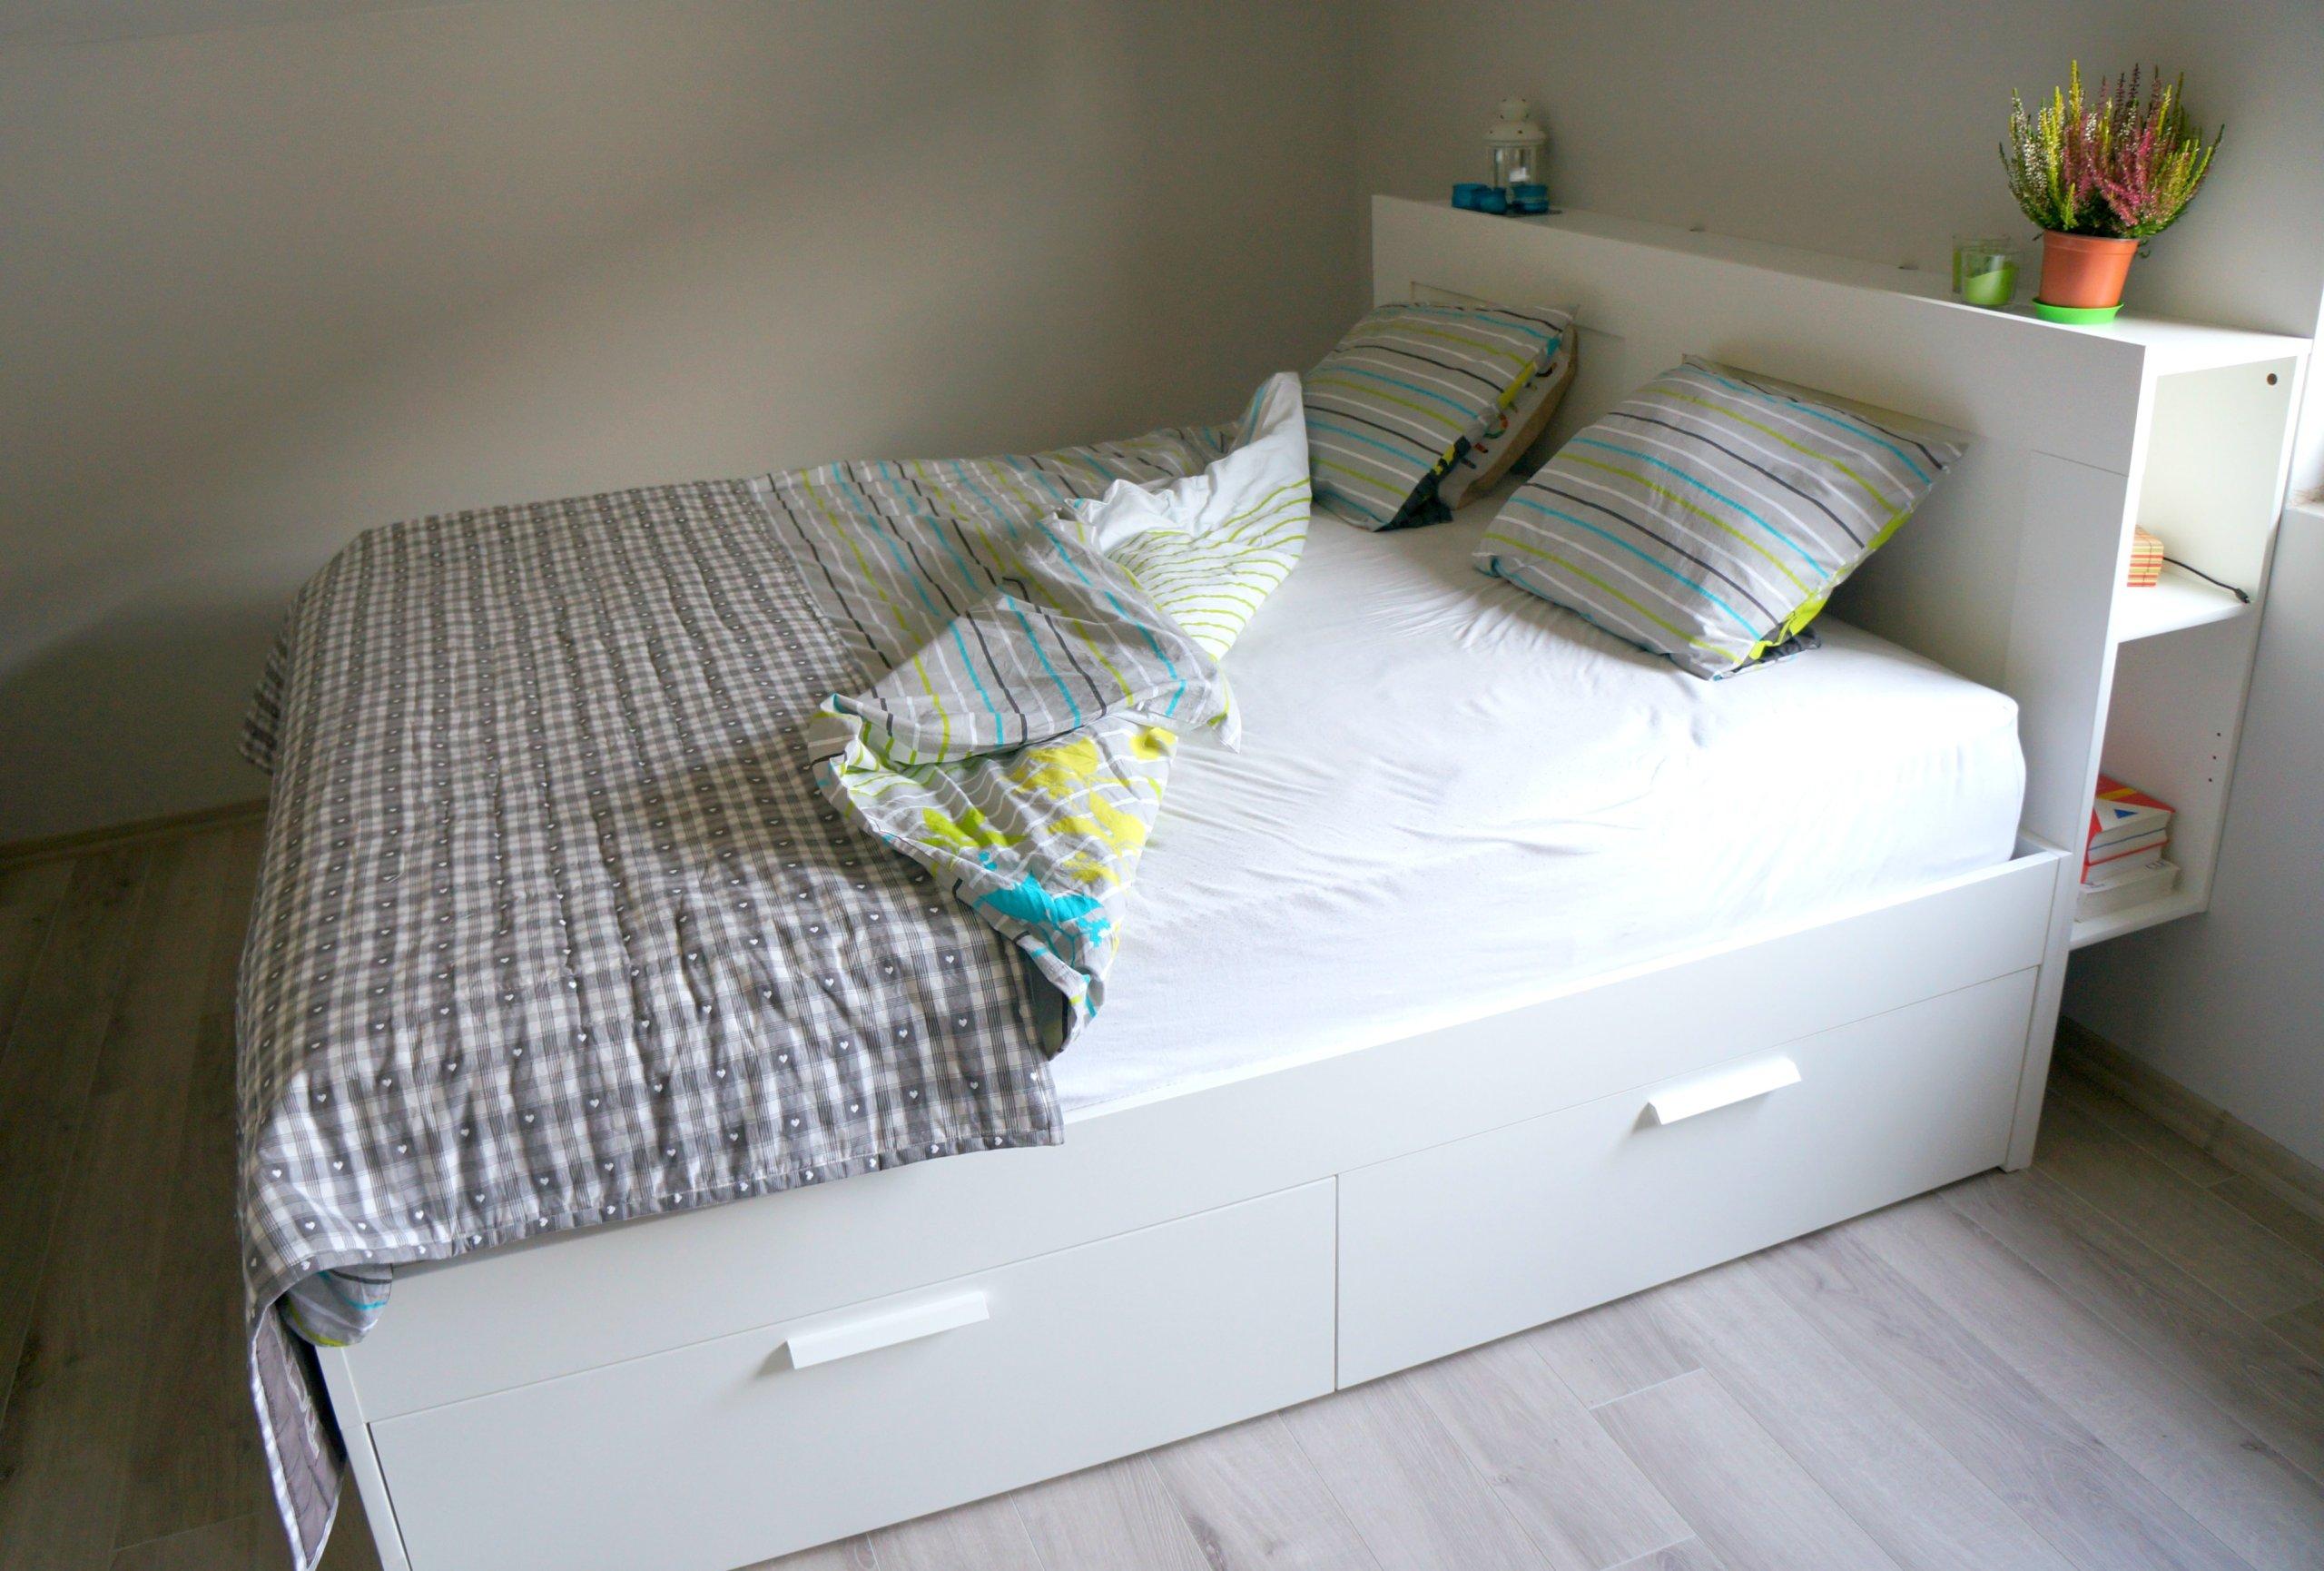 łóżko Brimnes Ikea 2 Materace 7006259318 Oficjalne